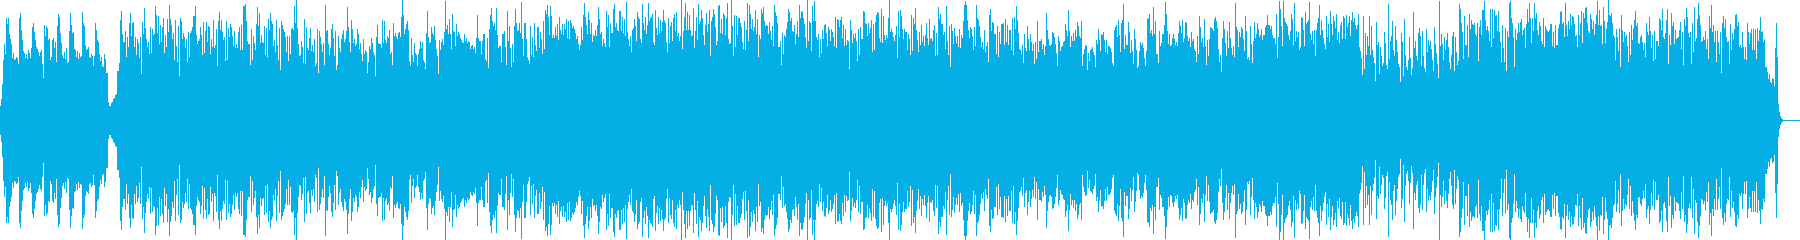 EDMアレンジのキラキラポップソング☆の再生済みの波形